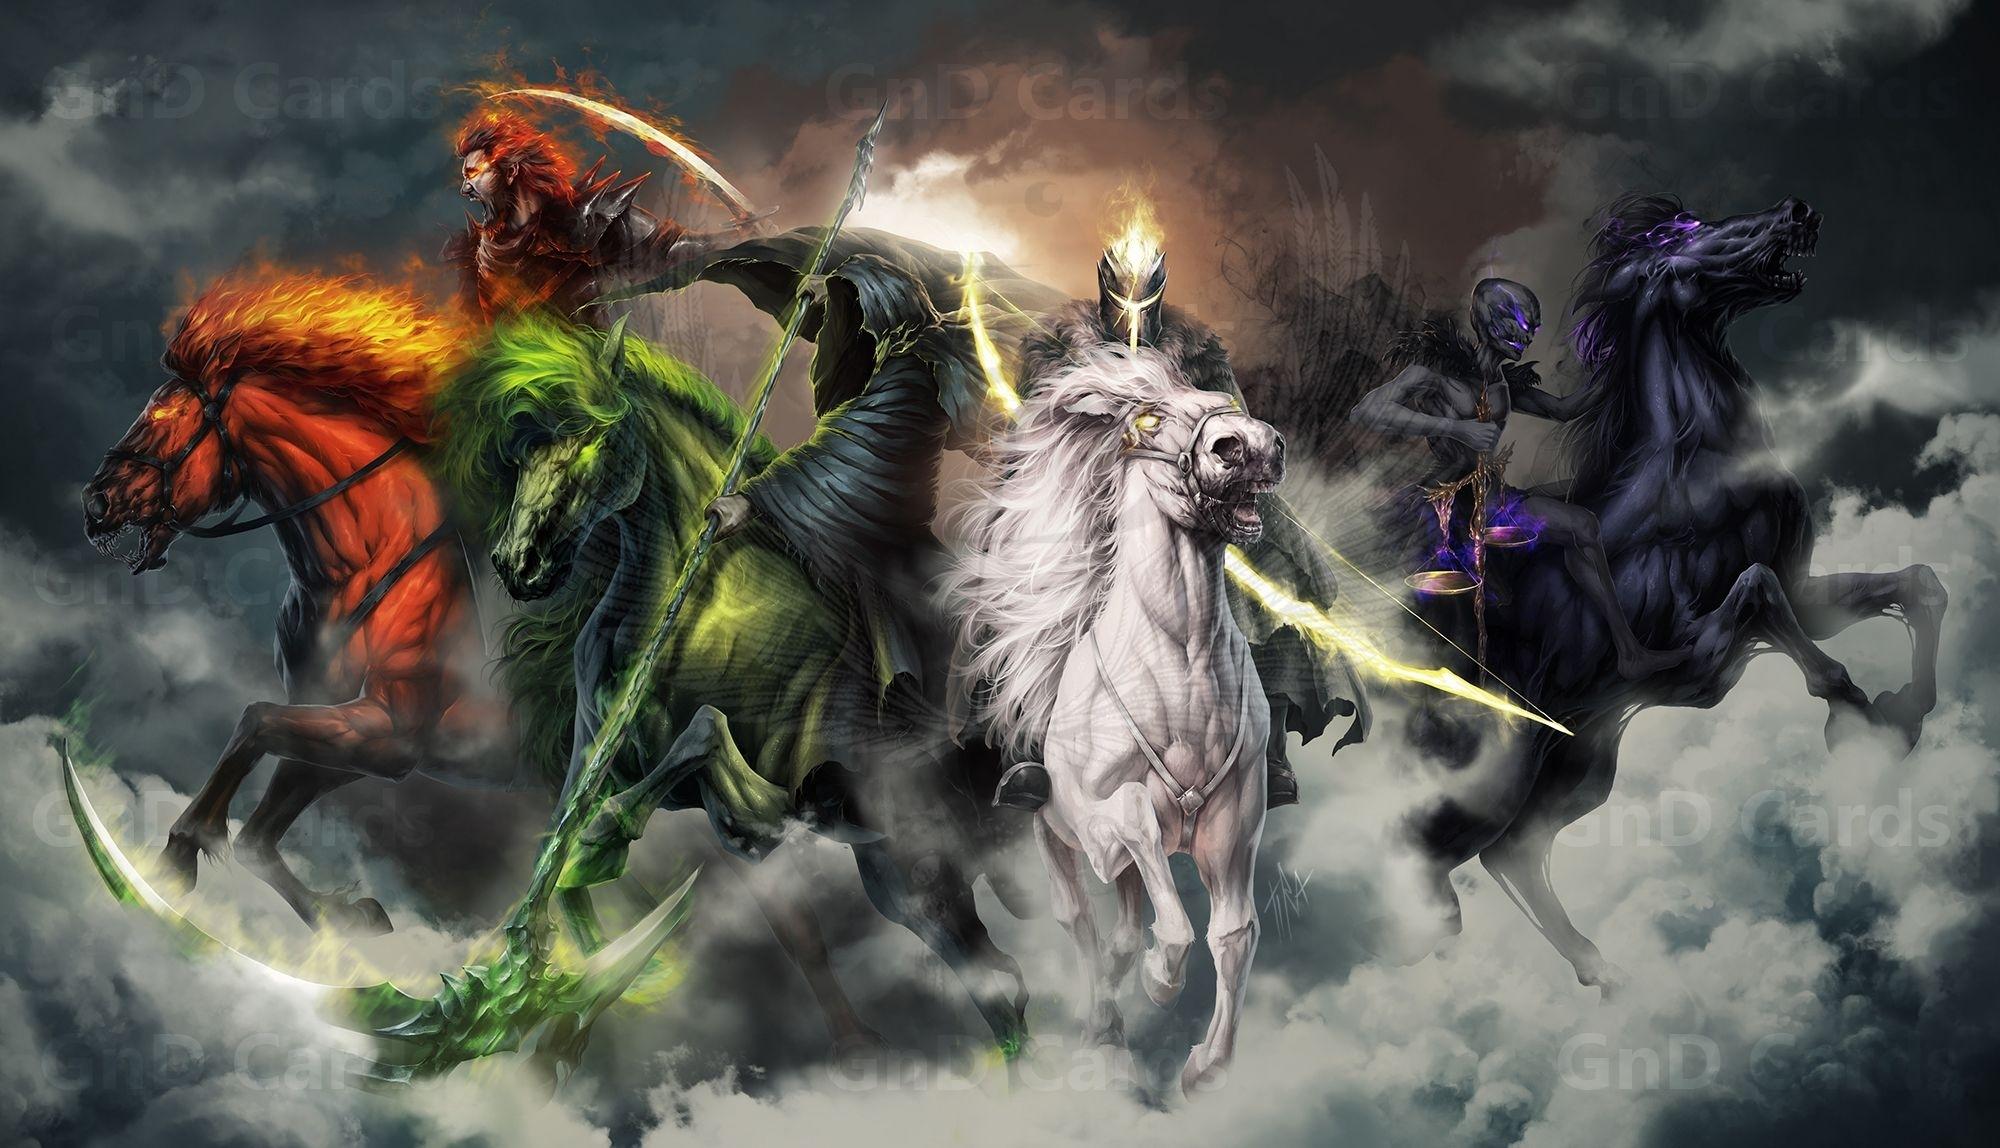 four horsemen of the apocalypsetira-owl.deviantart on